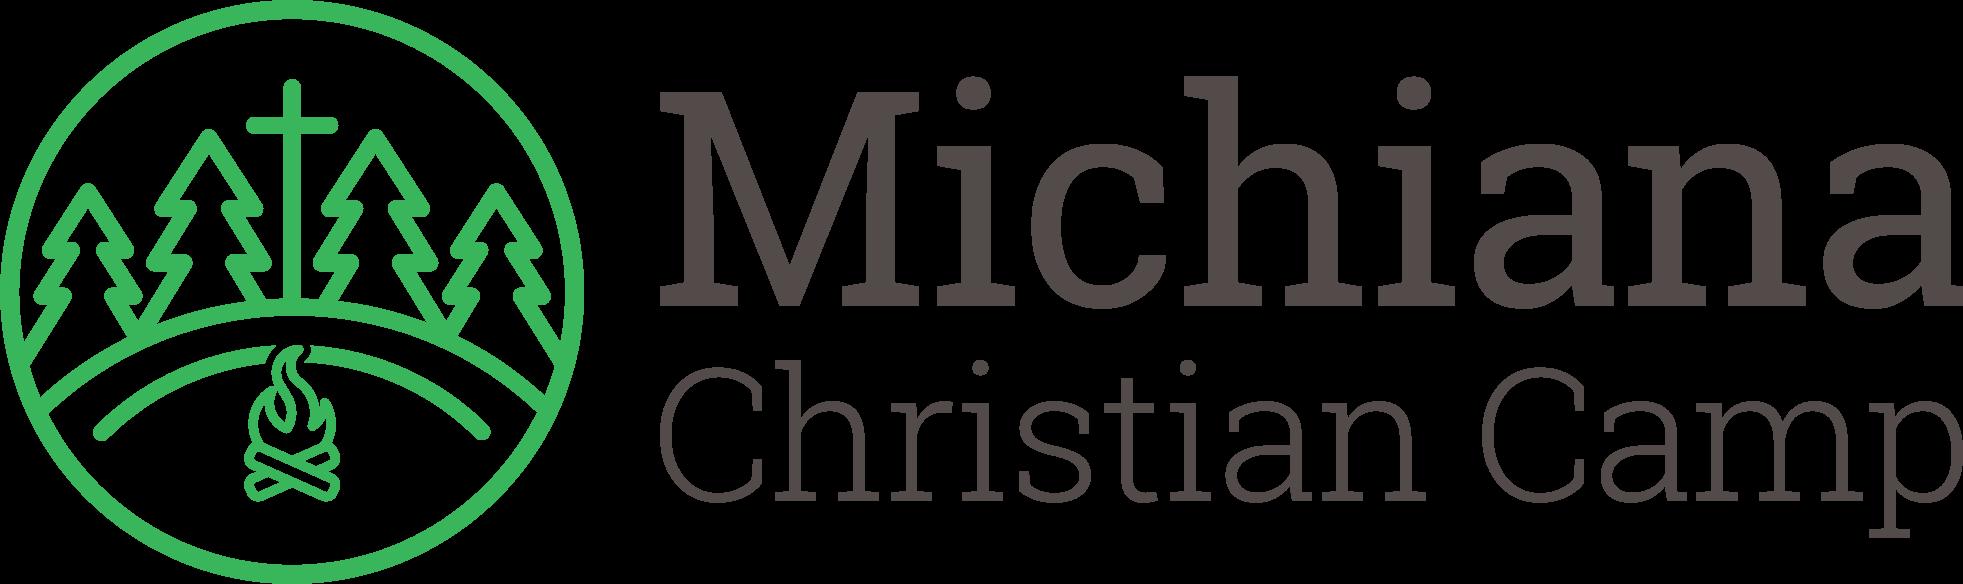 michiana-christian-camp-horizontal.png